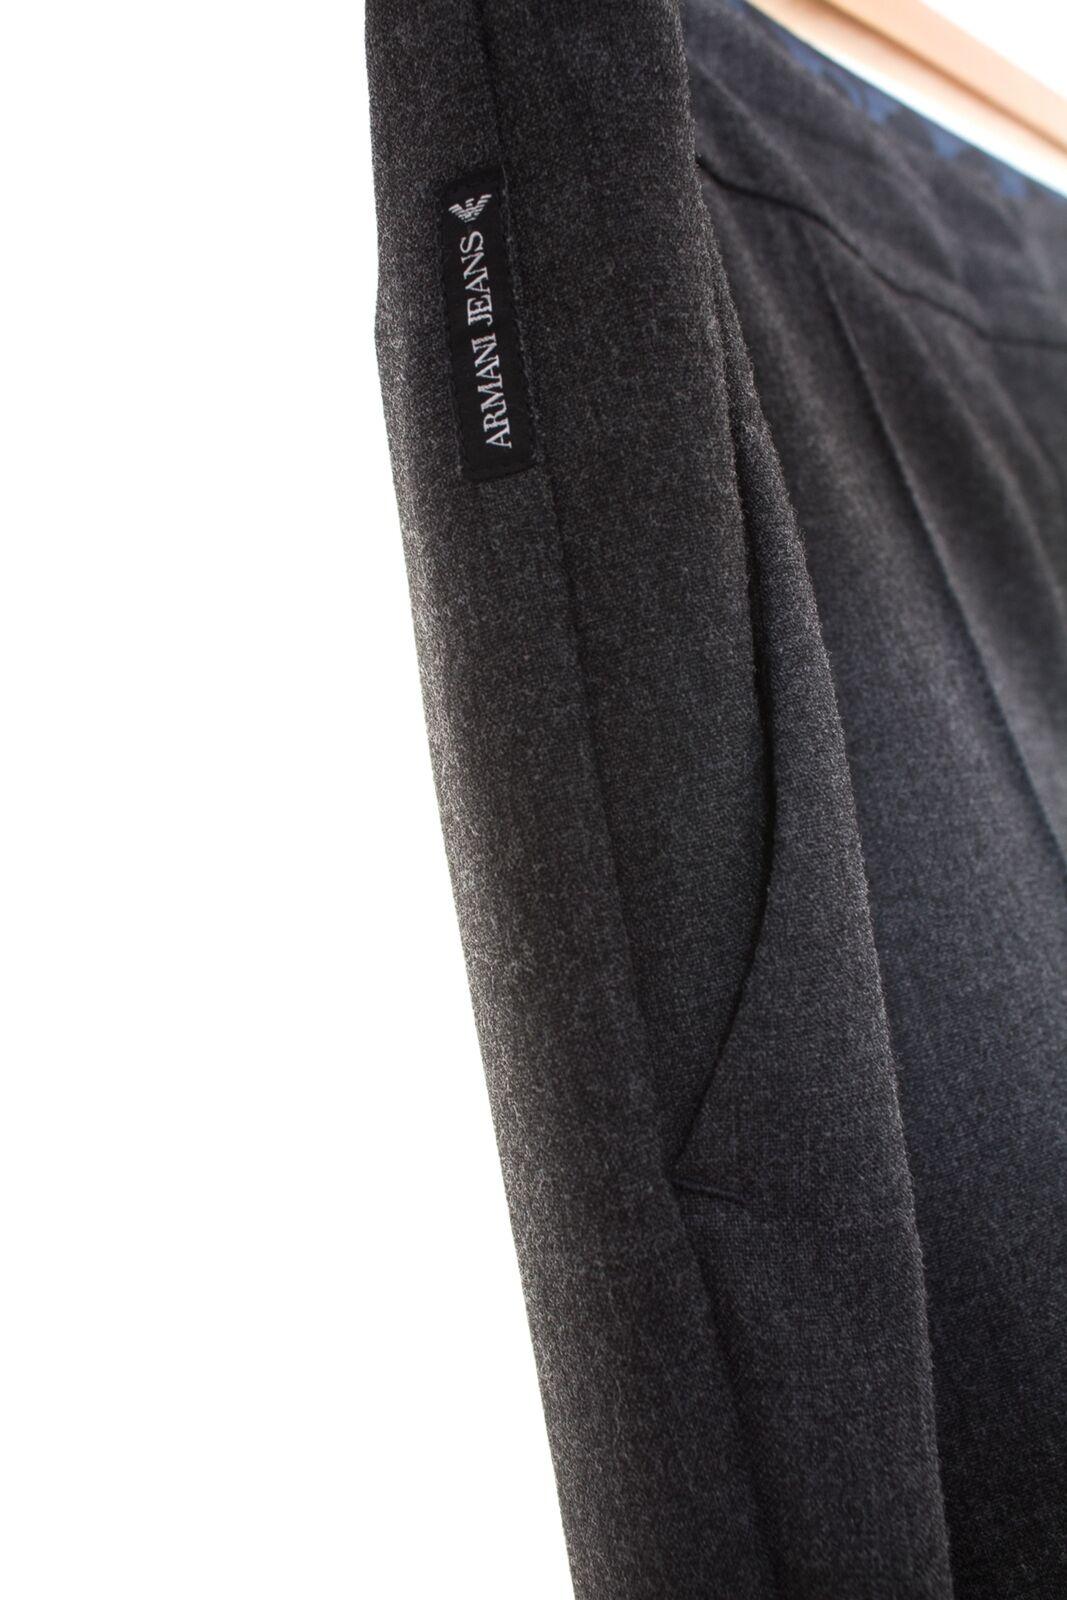 ARMANI ARMANI ARMANI JEANS Pantaloni Tg IT 48 de 42 Donna Tessuto Business Pantaloni Trousers Pants GRIGIO fab384